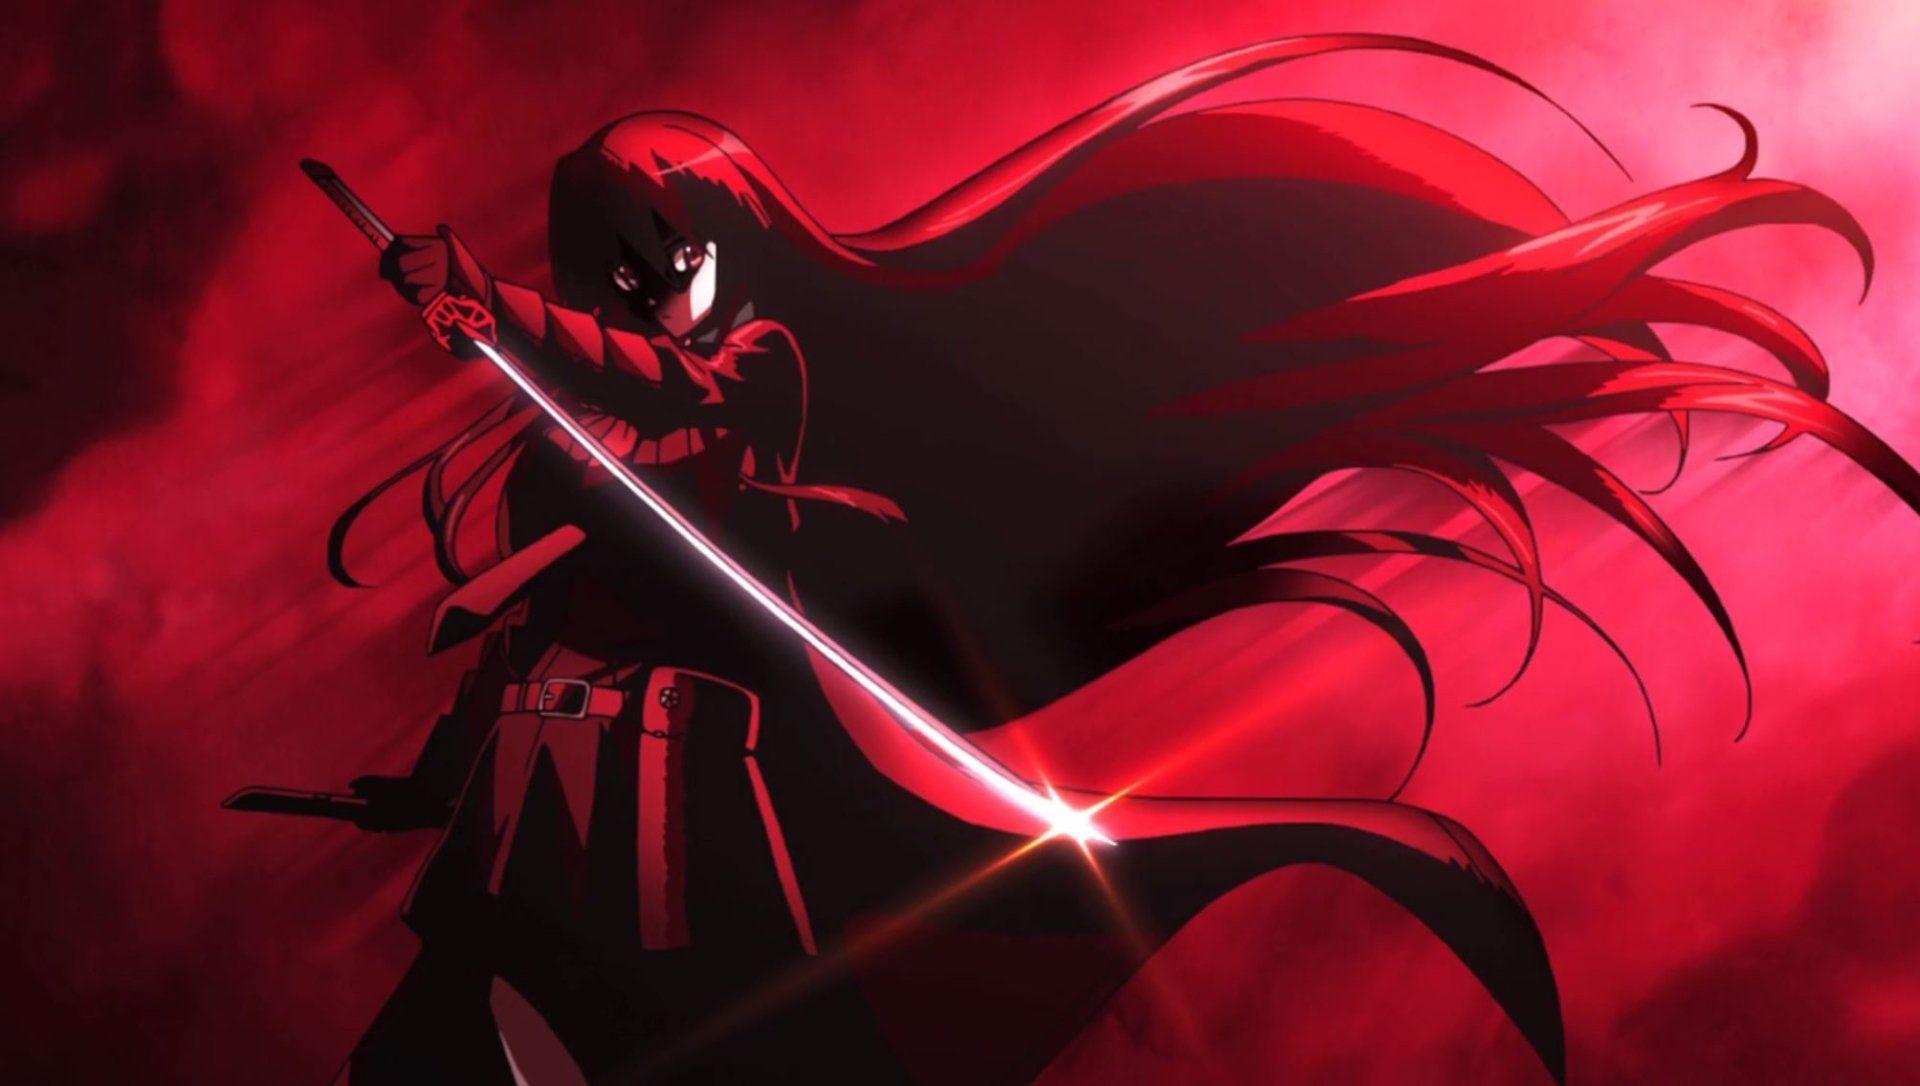 Anime Akame Ga Kill Akame Akame Ga Kill Wallpaper Tapety Konie